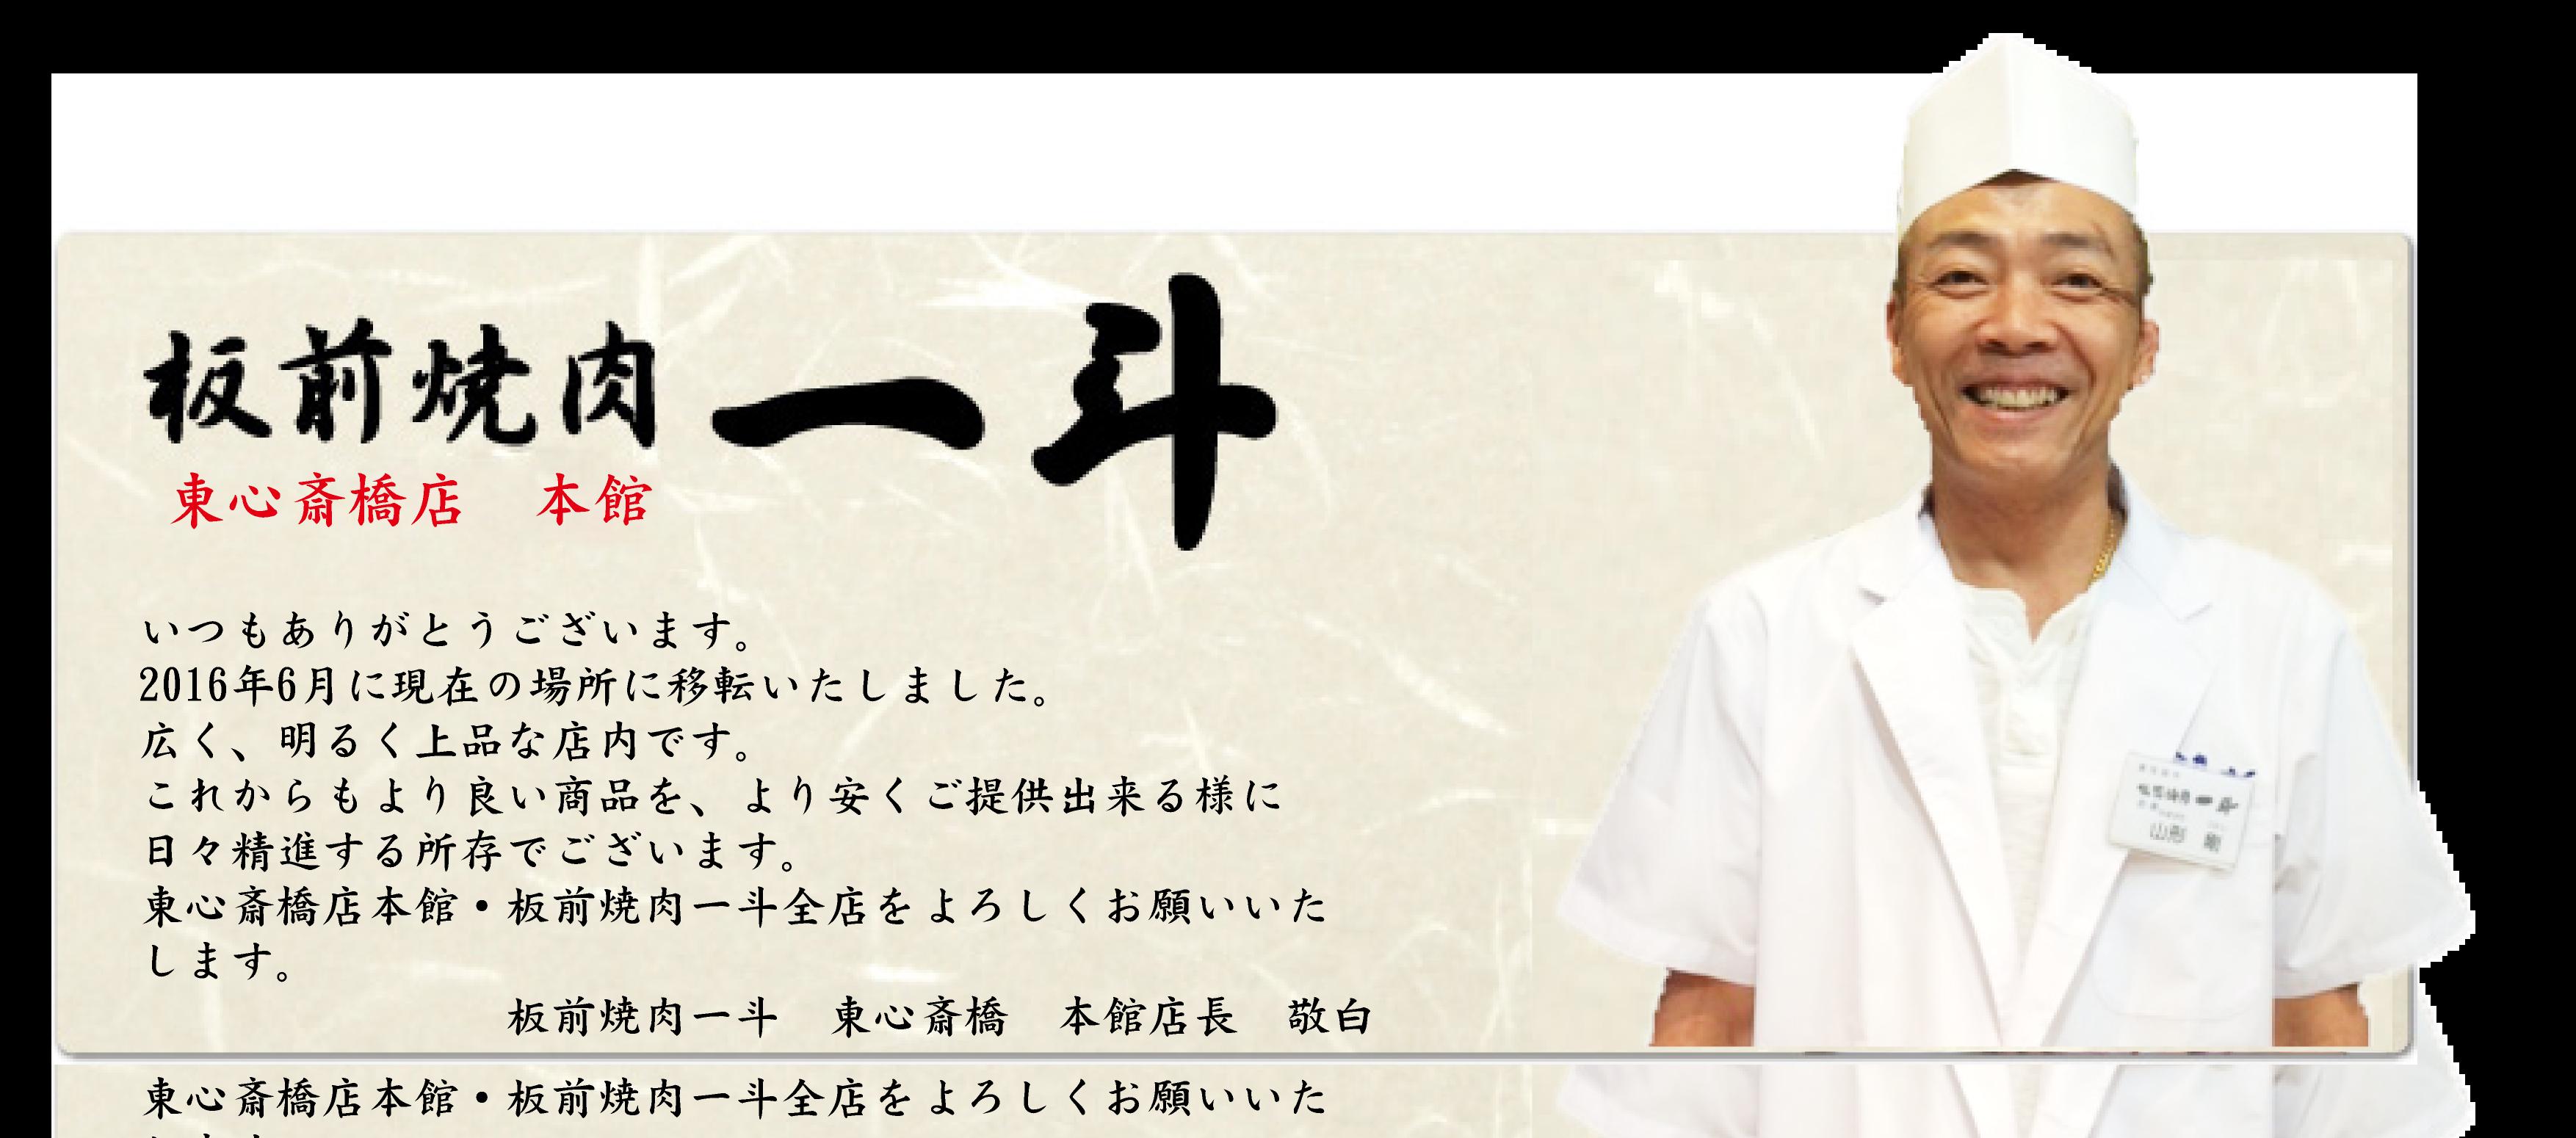 bg_master東心斎橋店本館3月10日-04